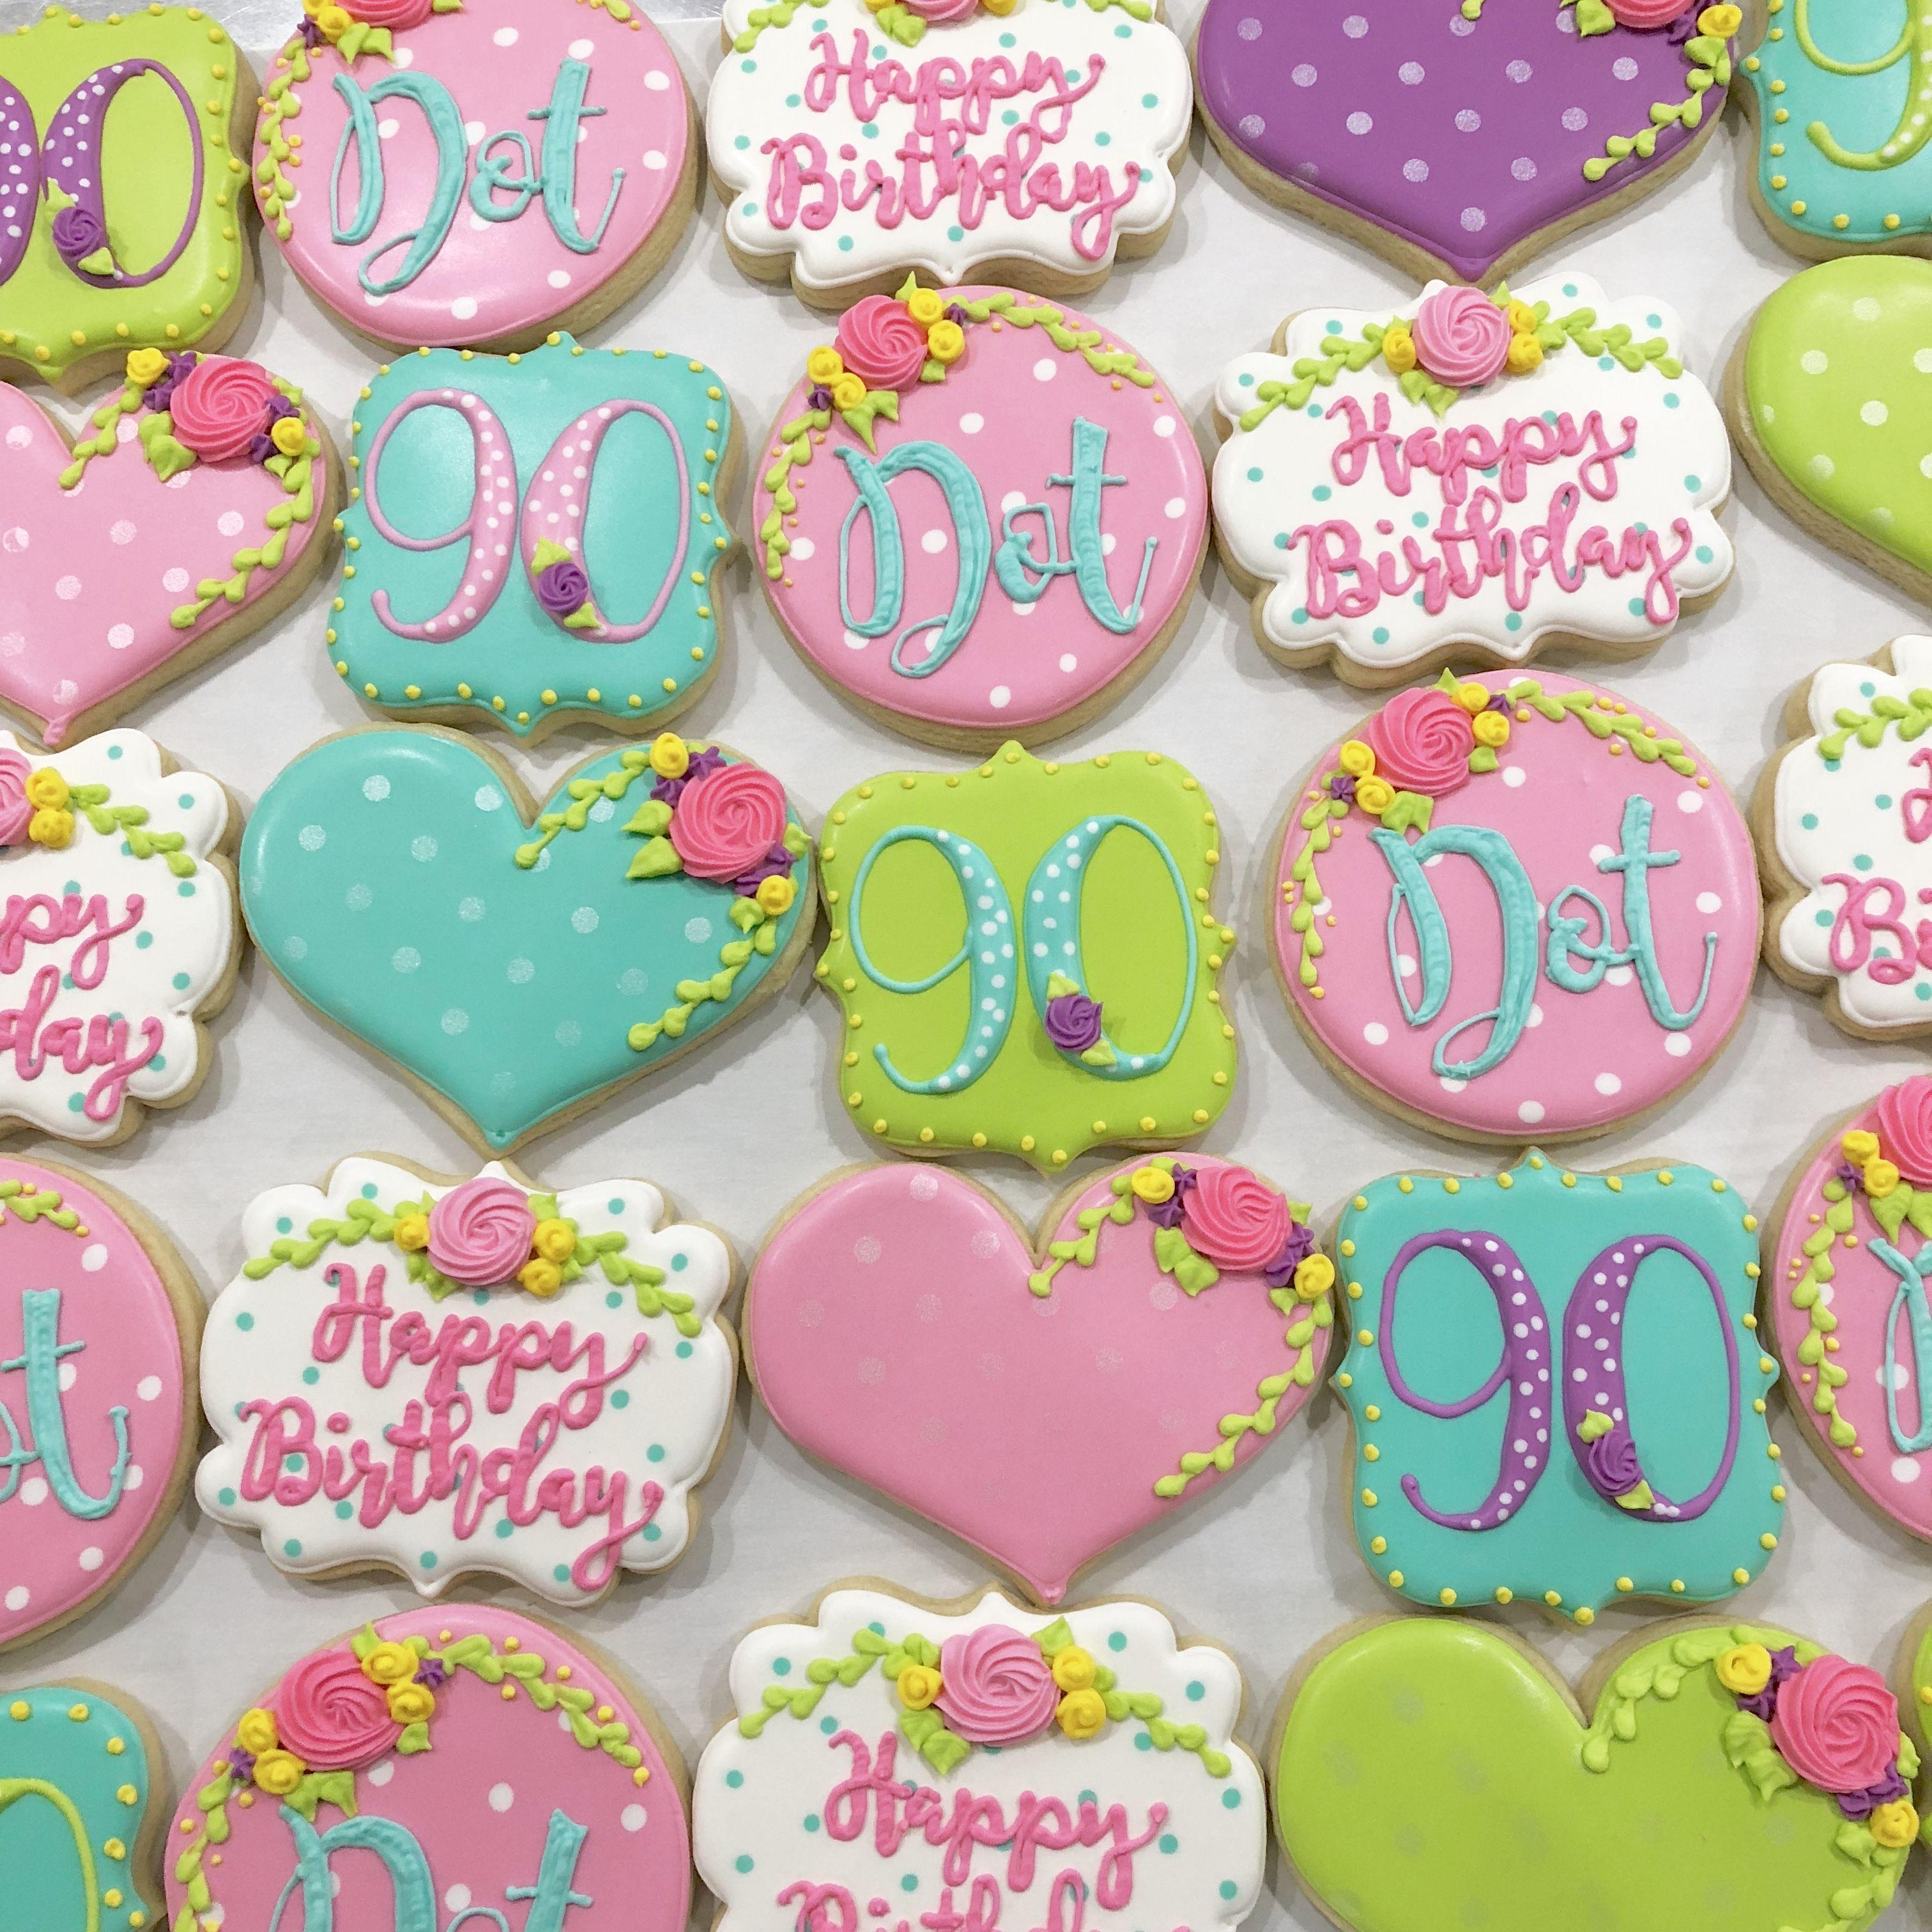 90th birthday decorated sugar cookies